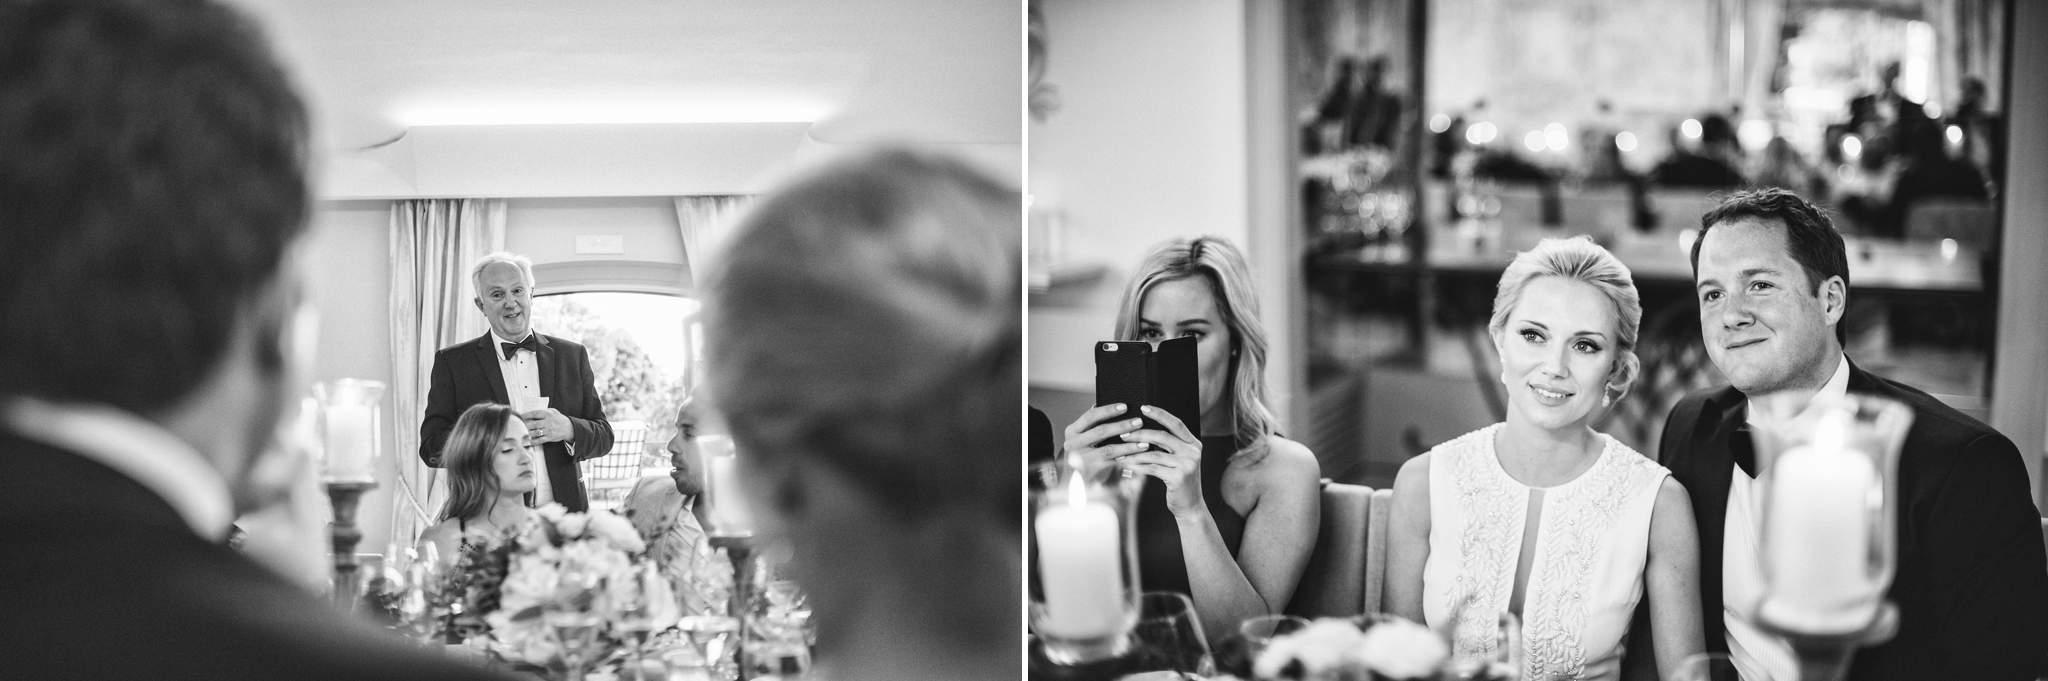 42wedding-photographer-belmond-san-michele-florence